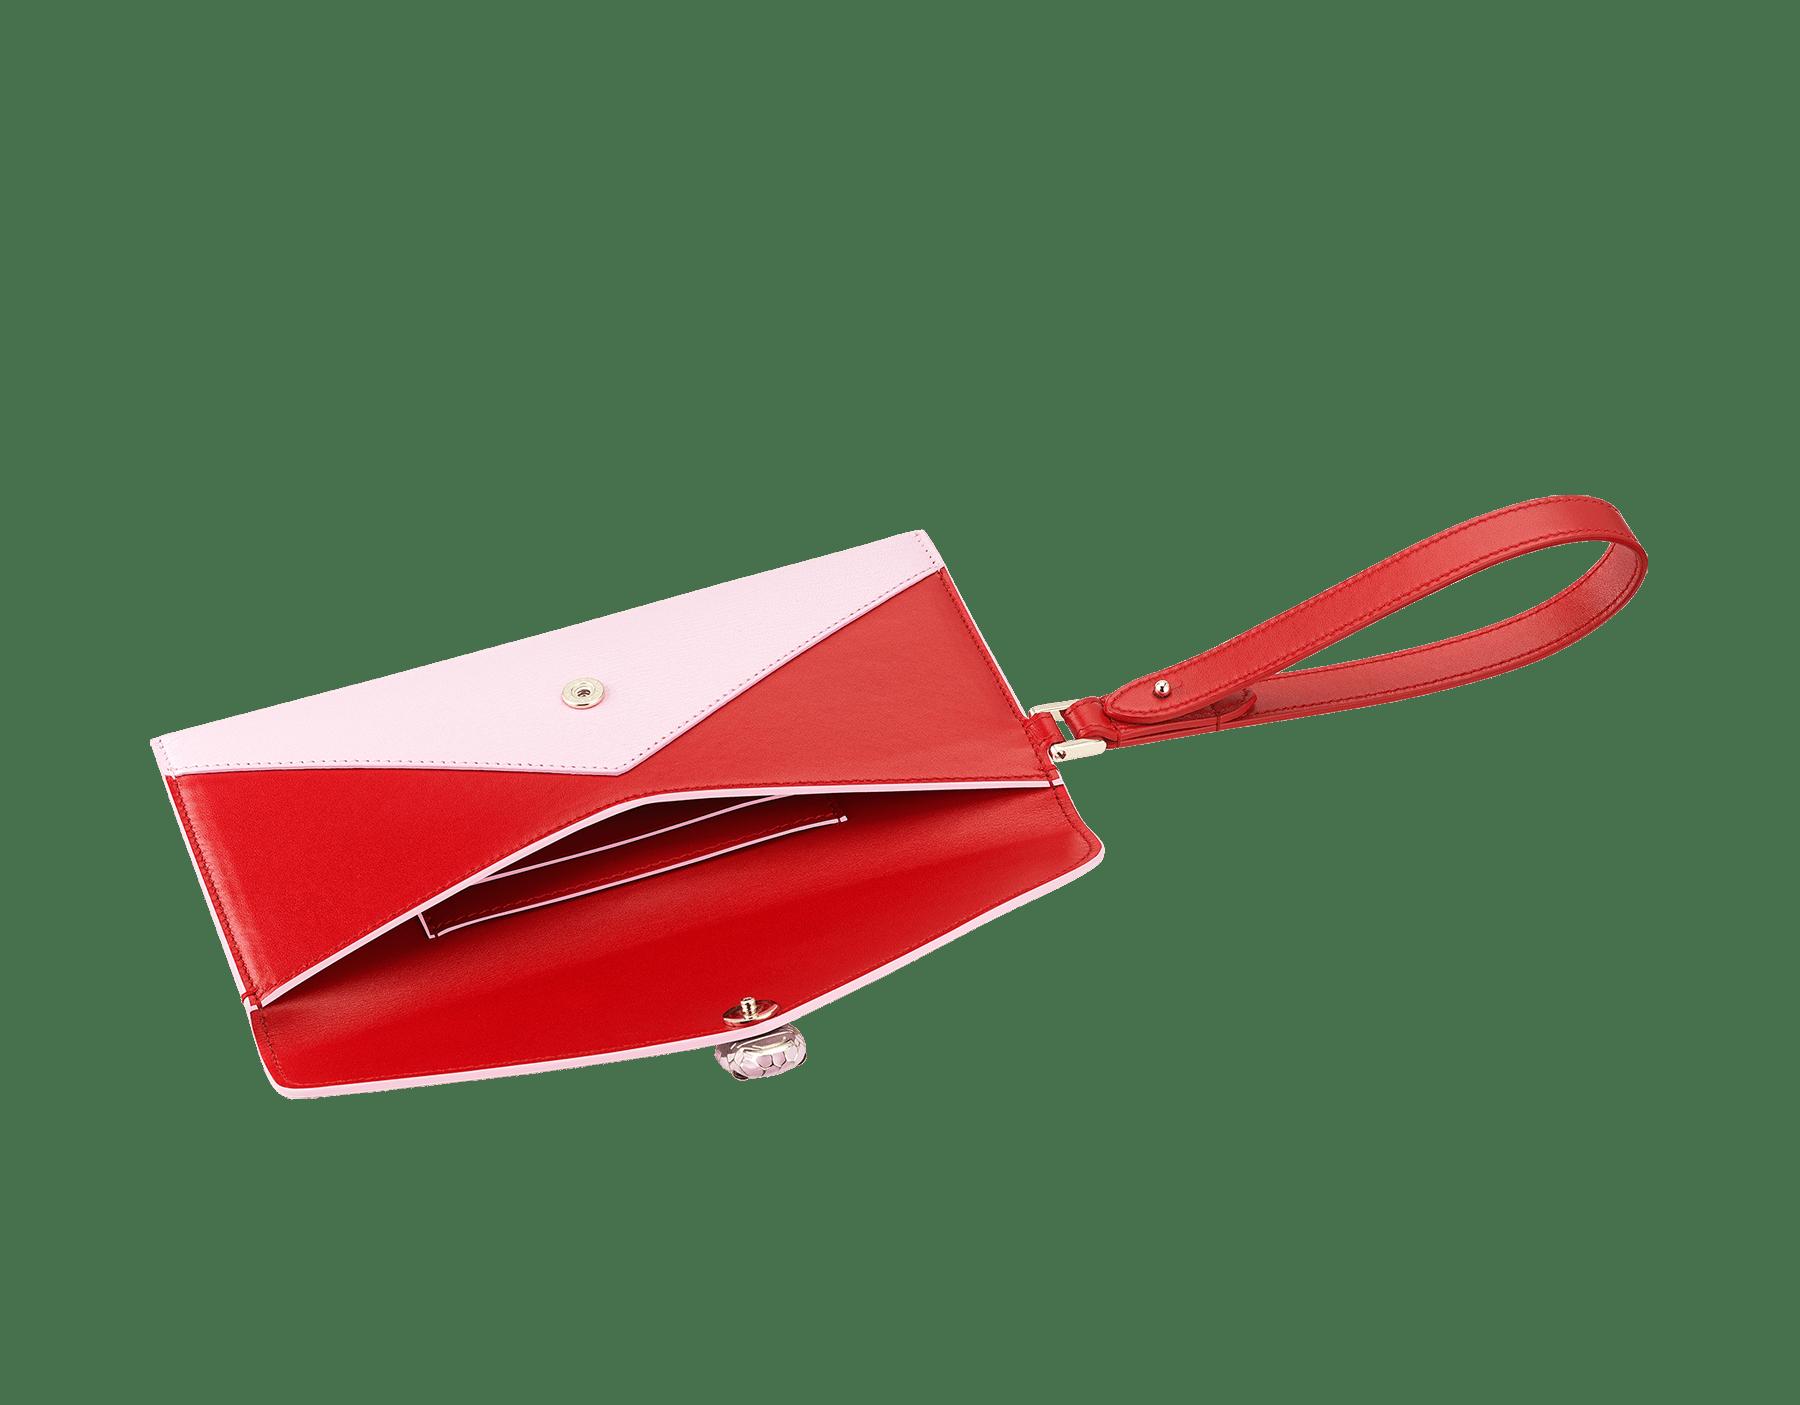 Serpenti Forever 信封型手拿包,採用洋紅碧玉色小牛皮和法國玫瑰色羊皮。經典蛇頭元素飾以法國玫瑰色和洋紅碧玉色琺瑯,蛇眼鑲飾黑色縞瑪瑙。 289461 image 4